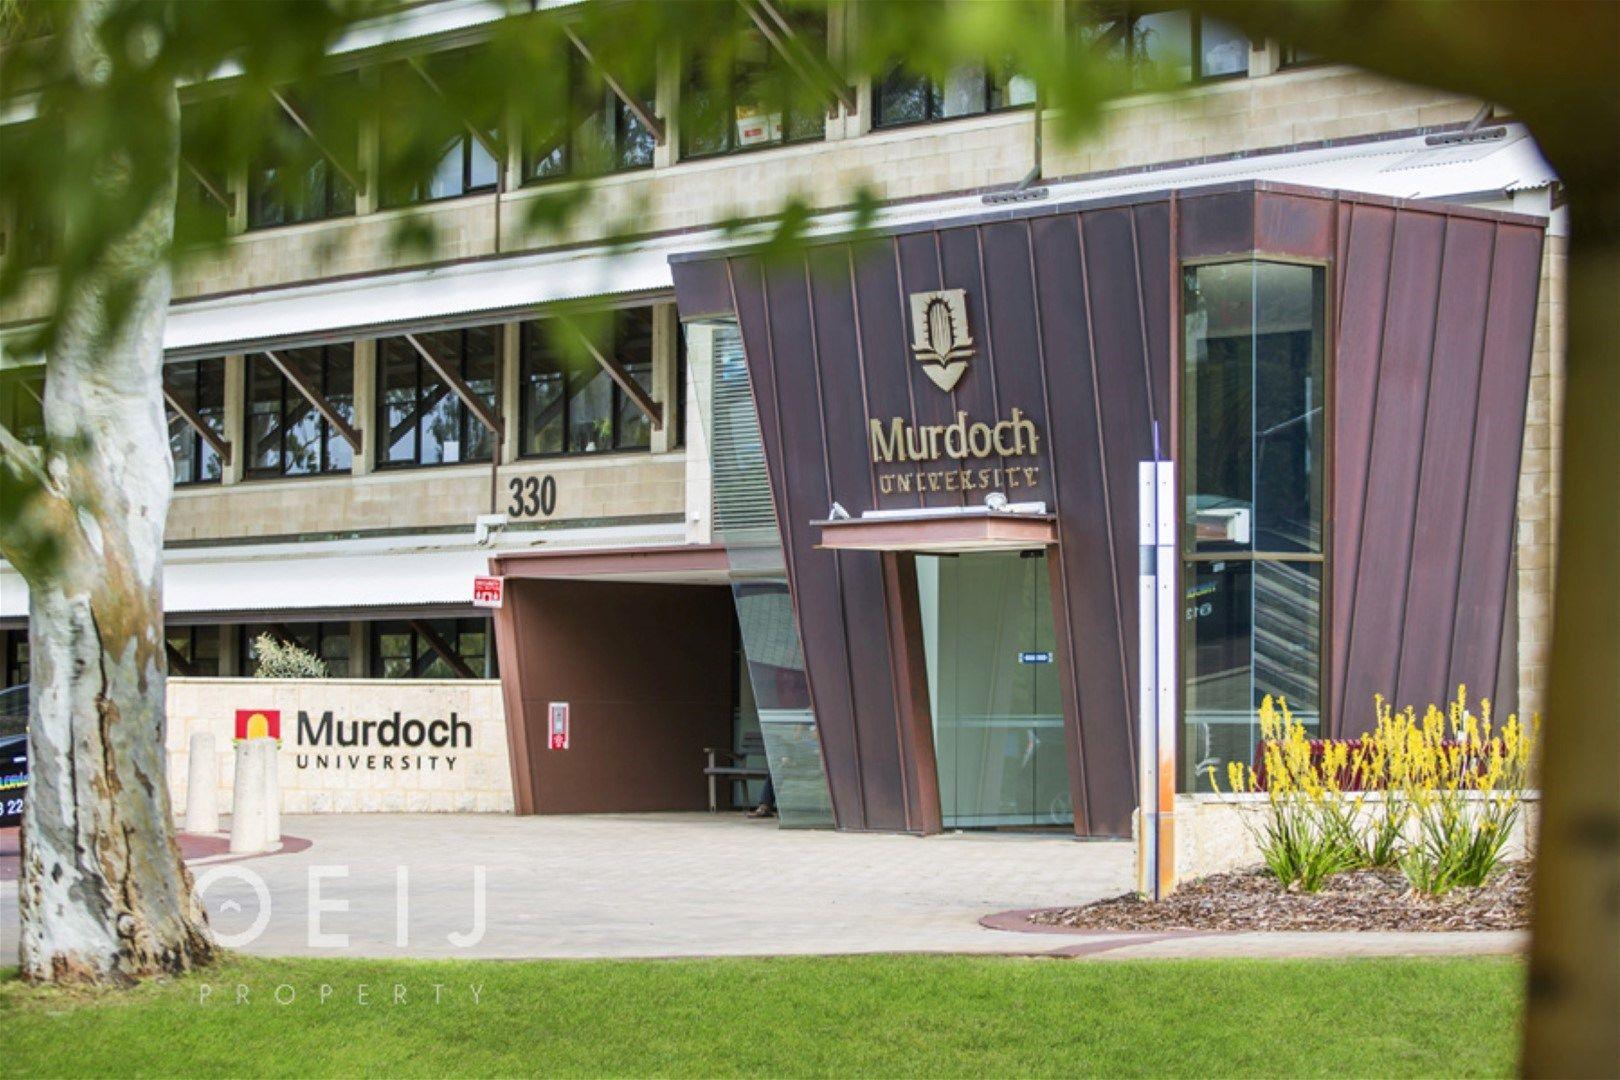 60 Johanson  Promenade, Murdoch WA 6150, Image 0